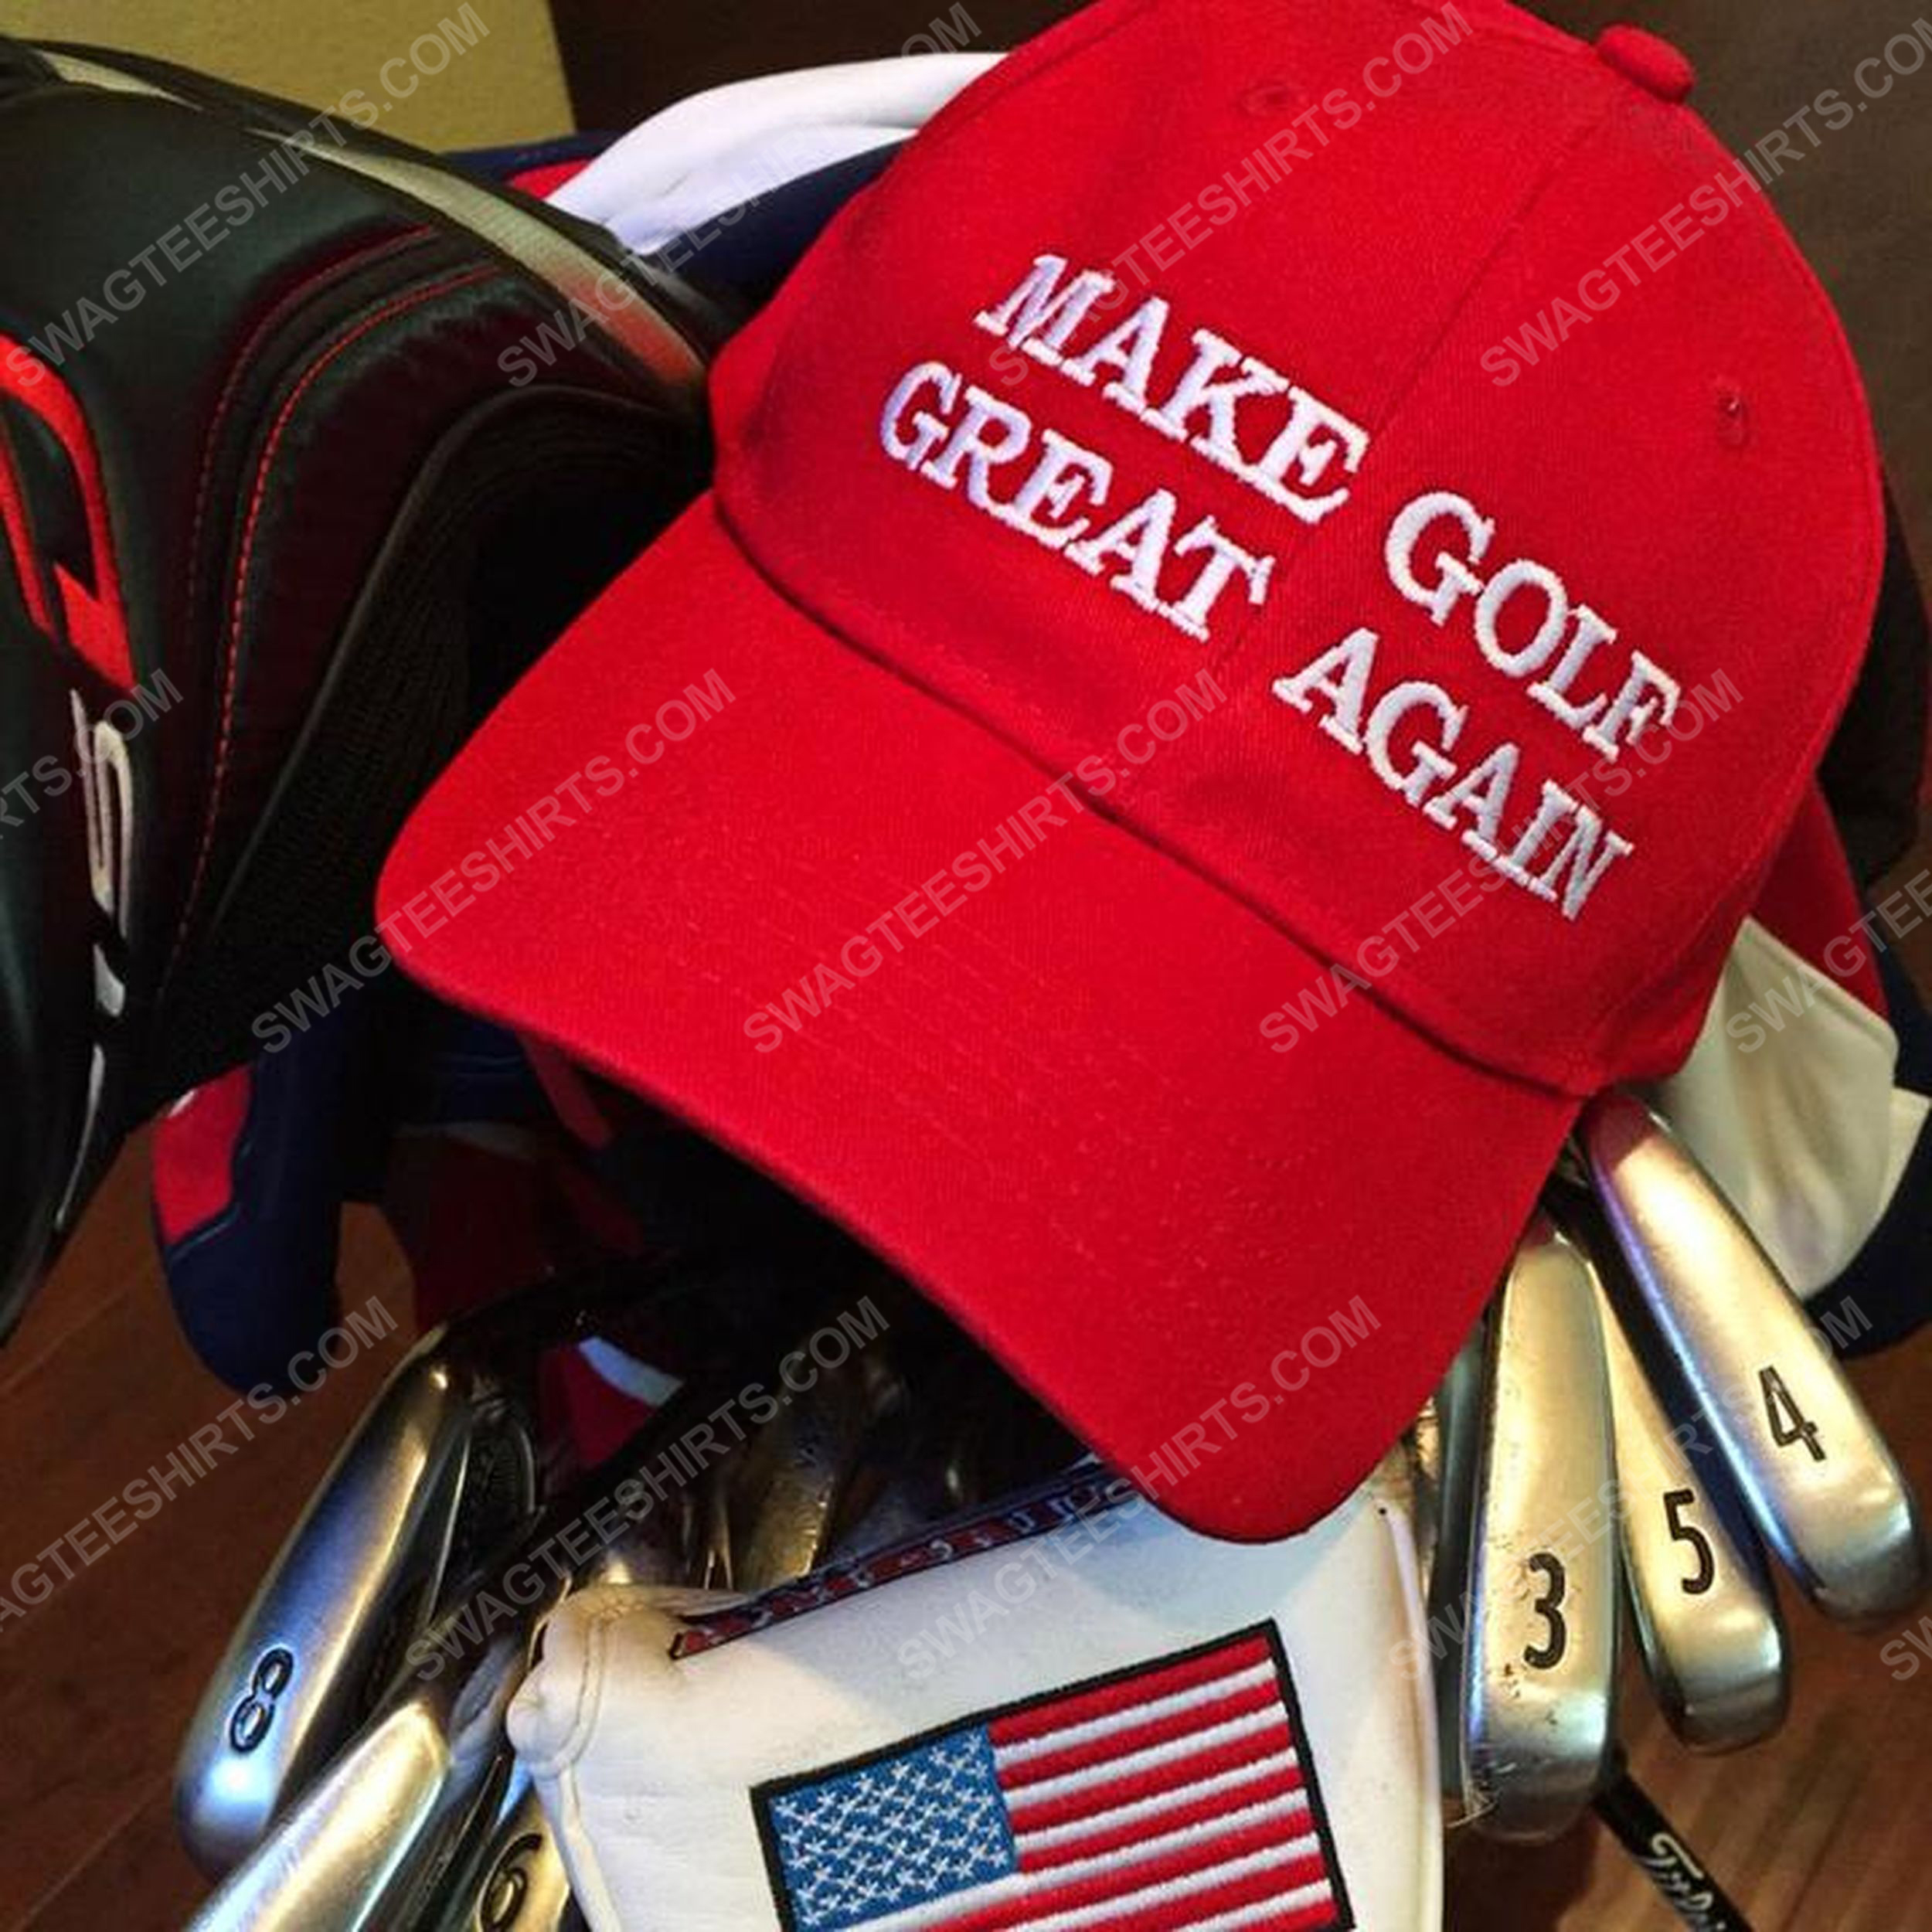 Make golf great again full print classic hat 1 - Copy